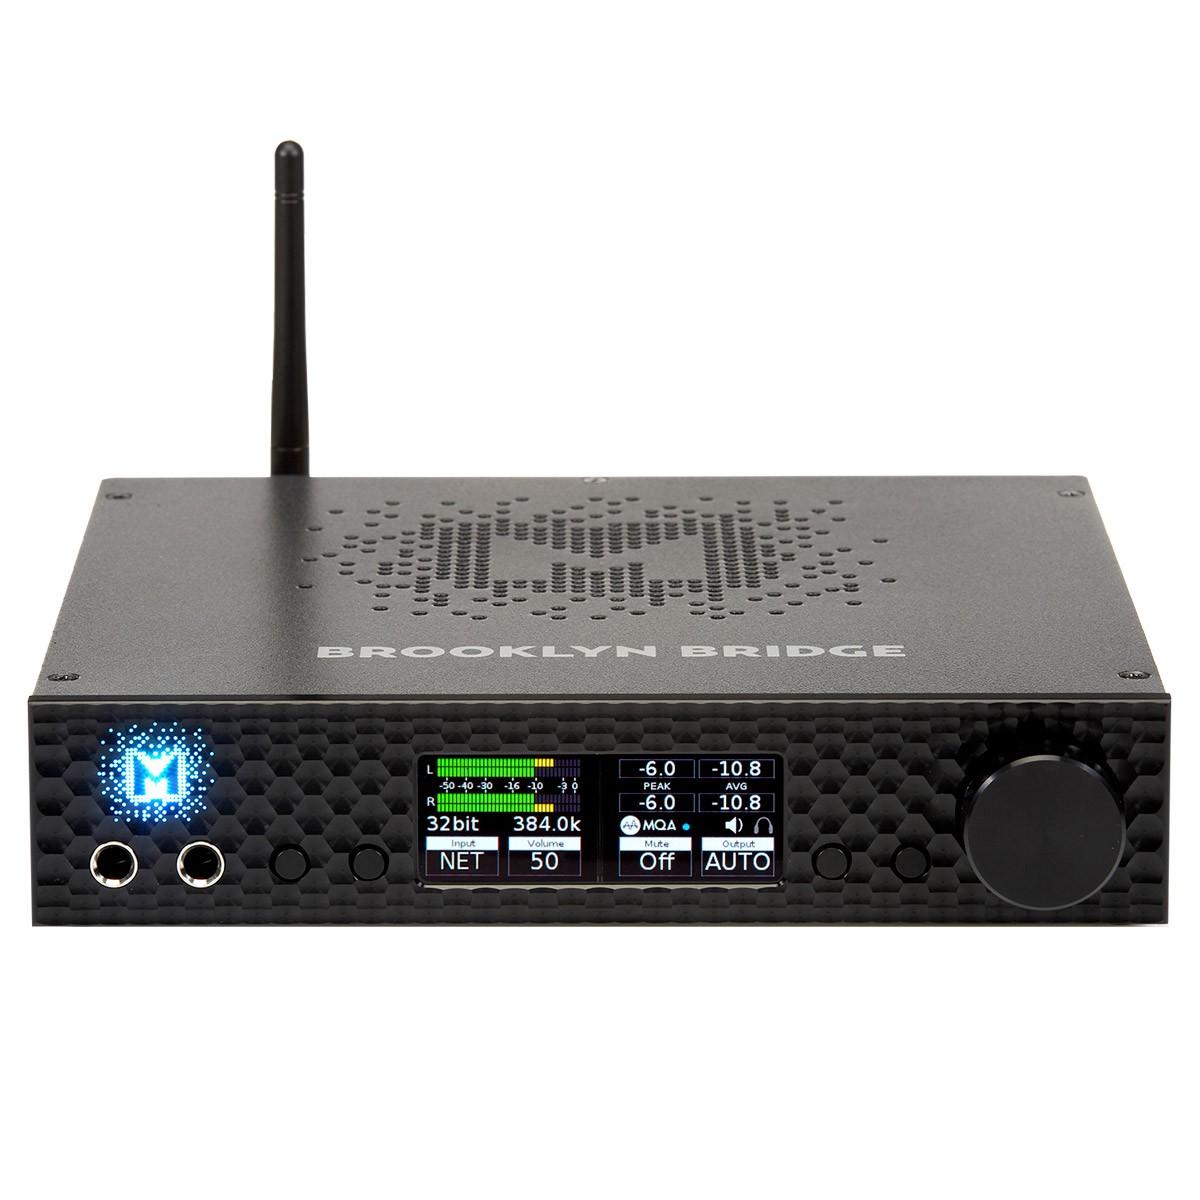 MYTEK BROOKLYN BRIDGE Streamer DAC MM/MC Phono Preamplifier ES9028Pro 32bit 384kHz DSD256 MQA